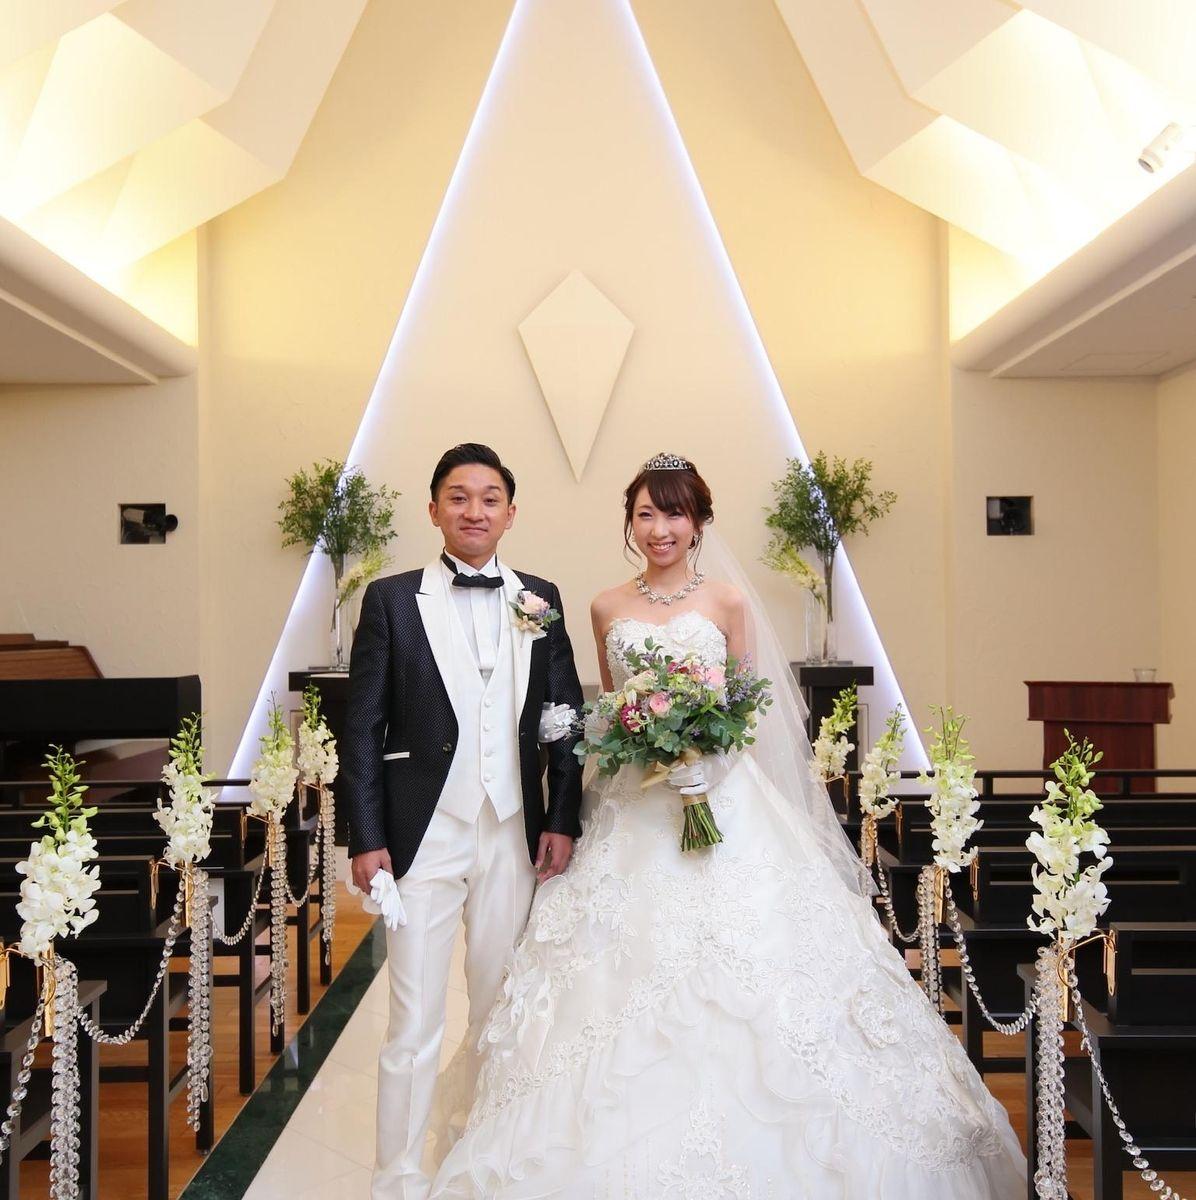 y_weddinggさんのKKRホテル博多写真1枚目